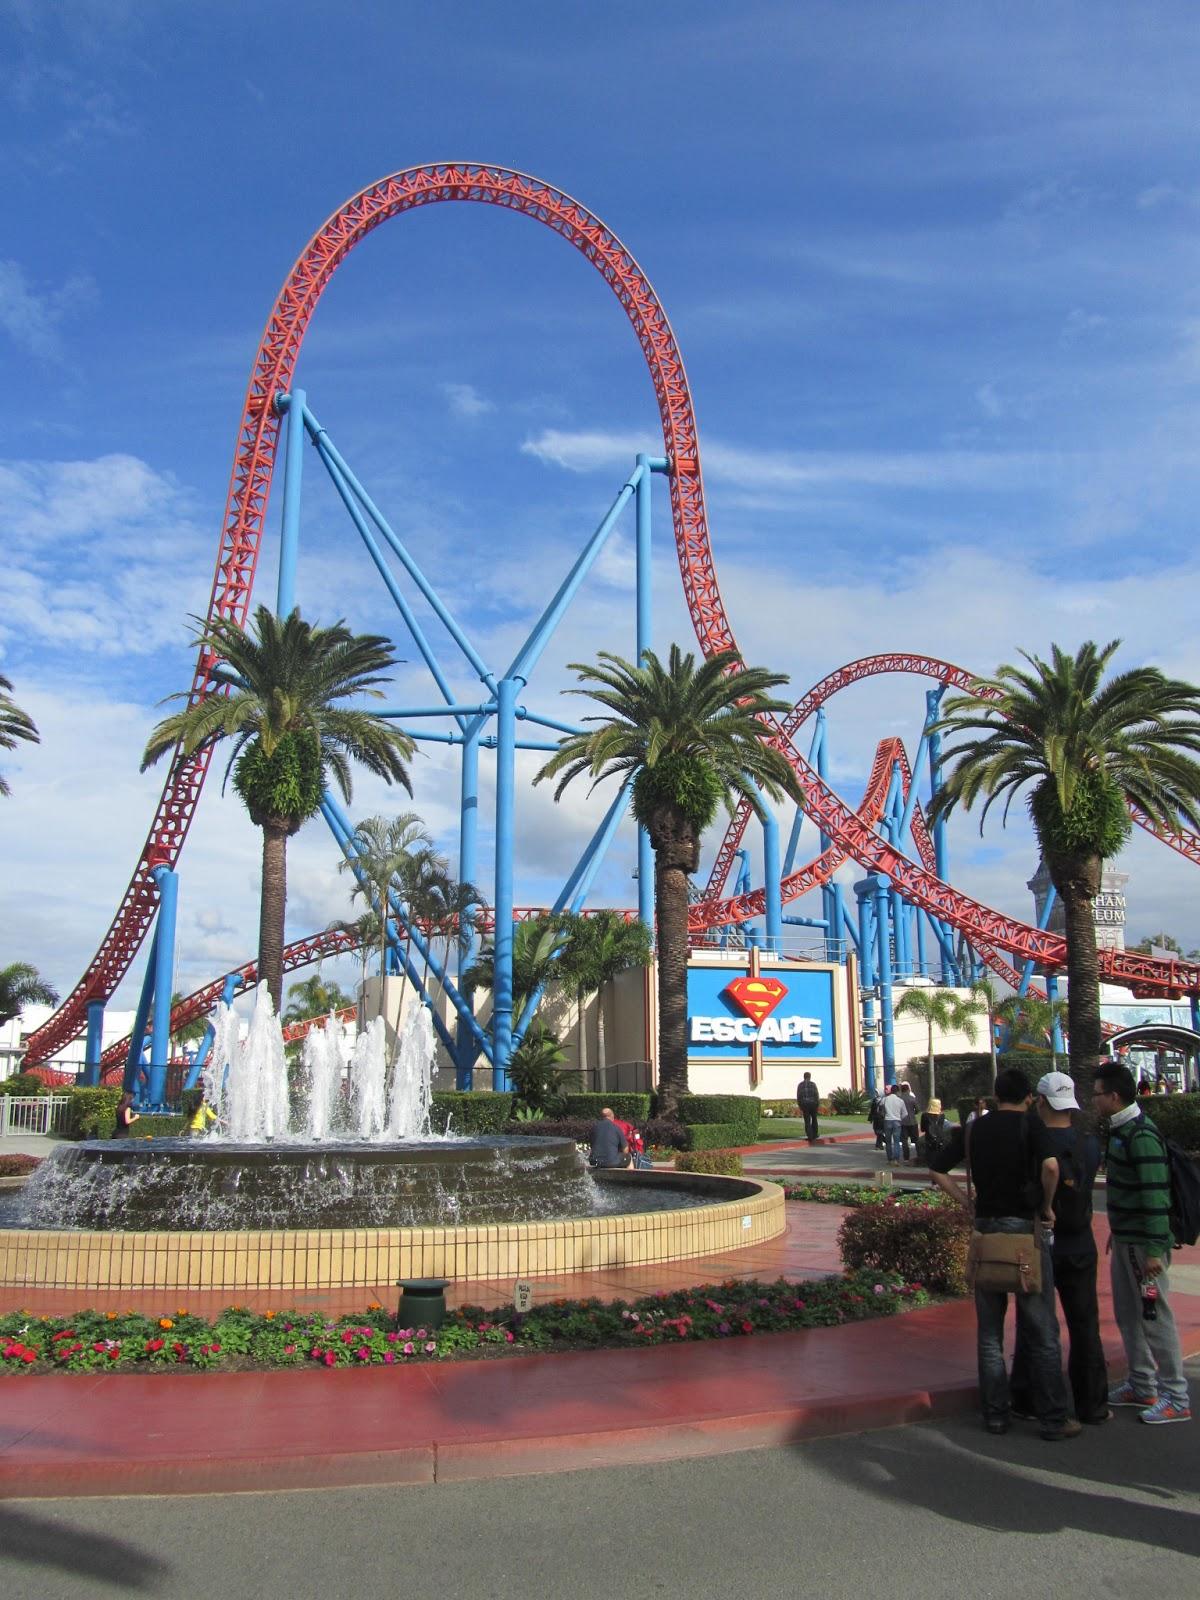 infinito viagens � austr225lia gold coast amp parques movie